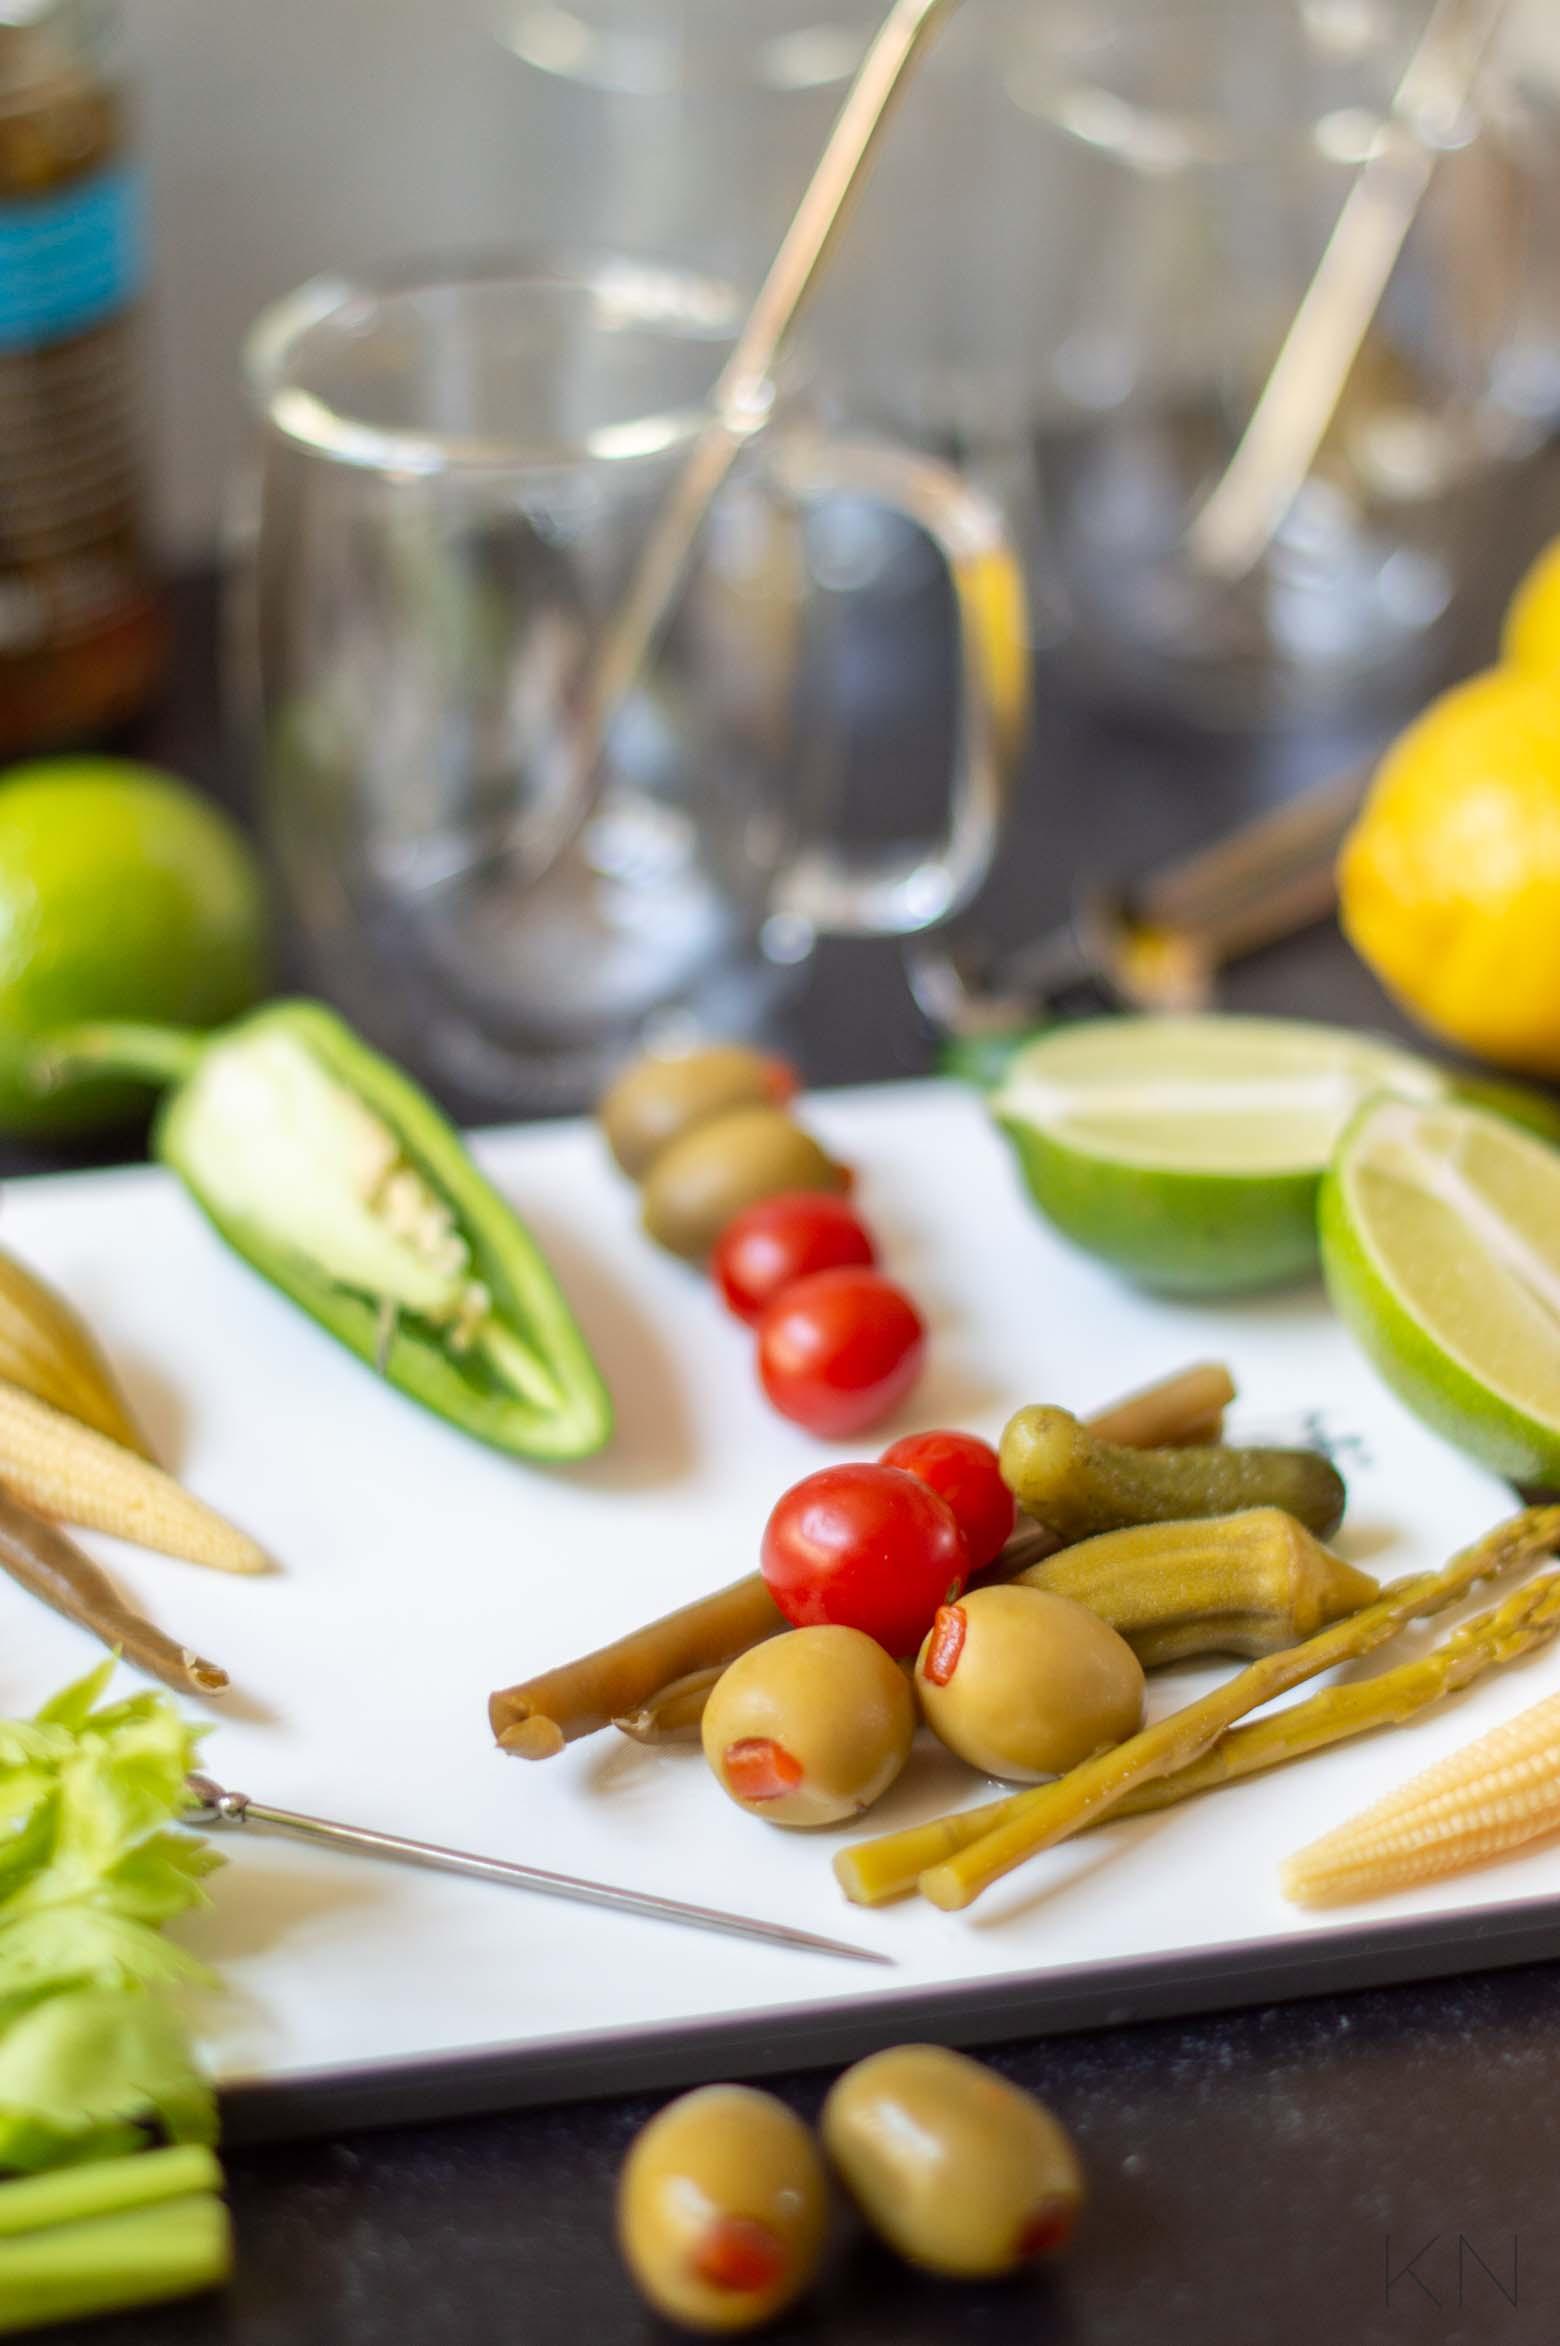 Garnish Ideas for Loaded Bloody Marys